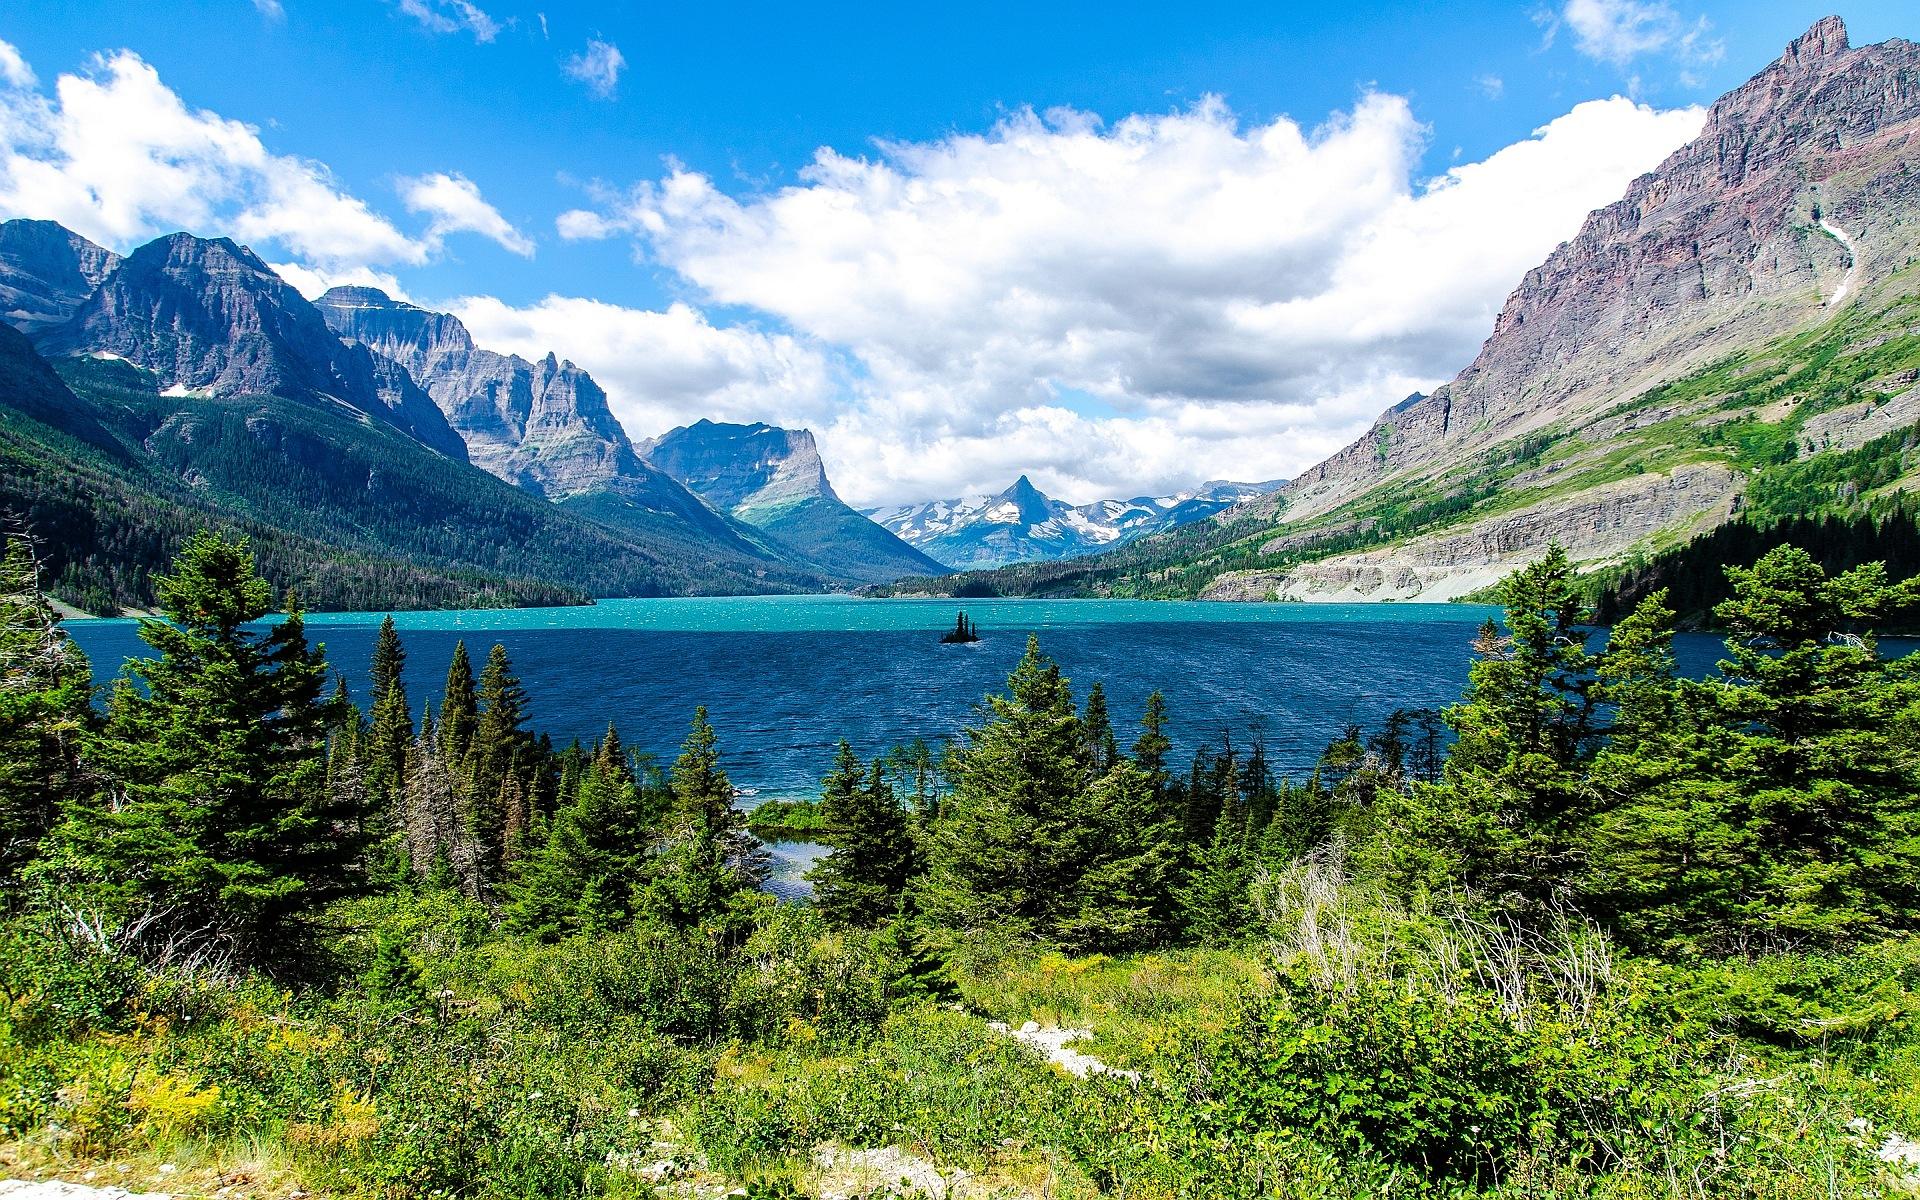 scenery alpine mountains